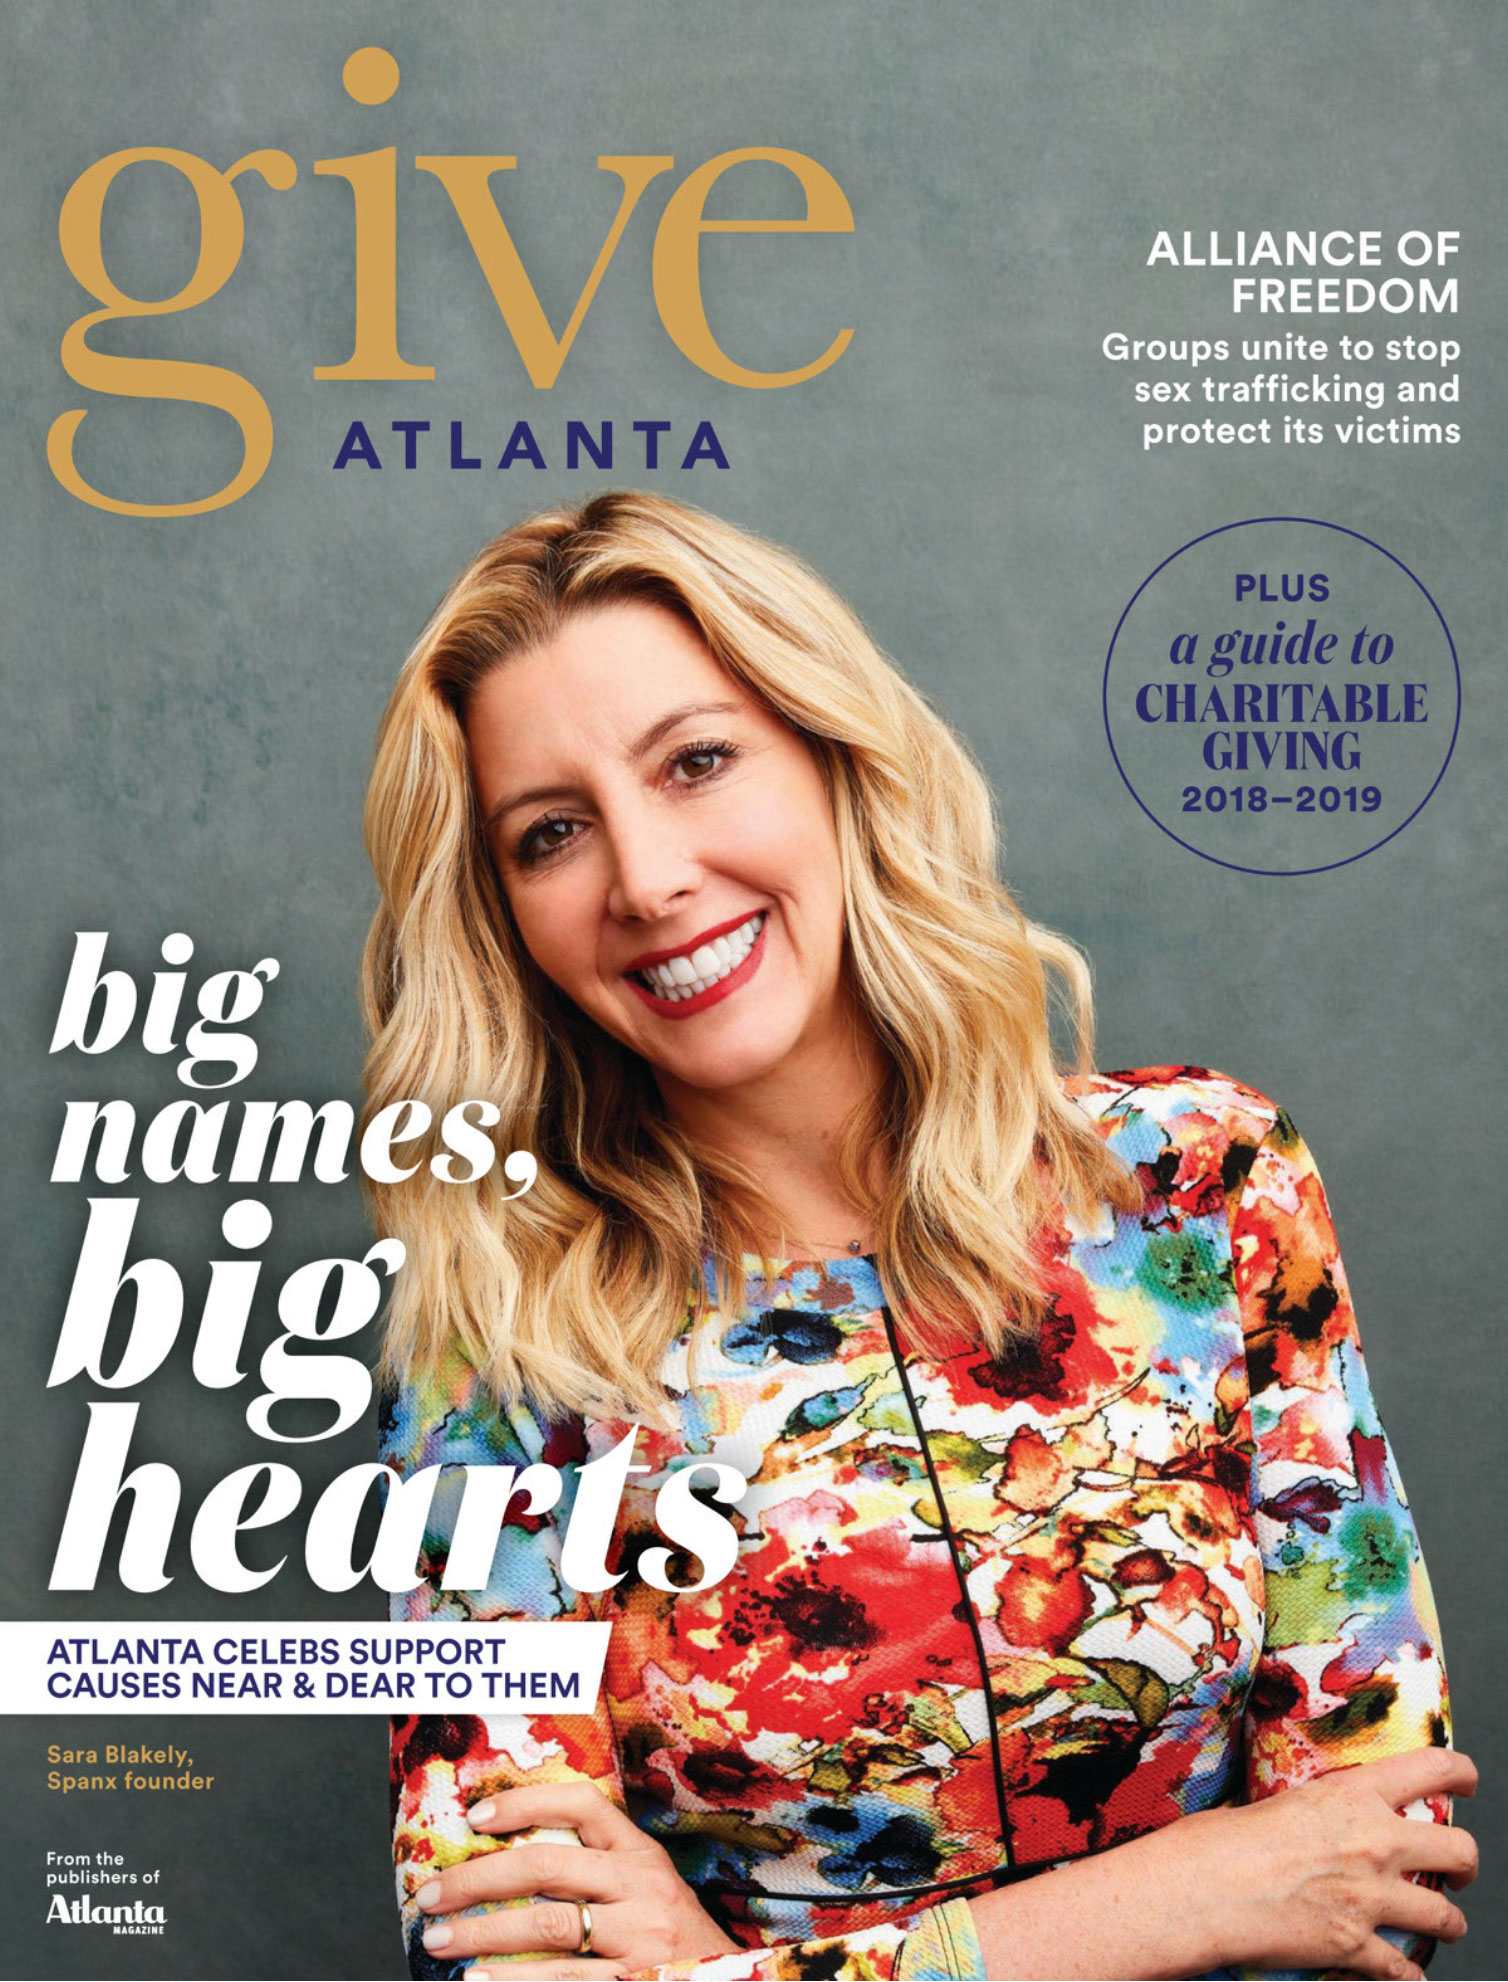 Give Atlanta Magazine